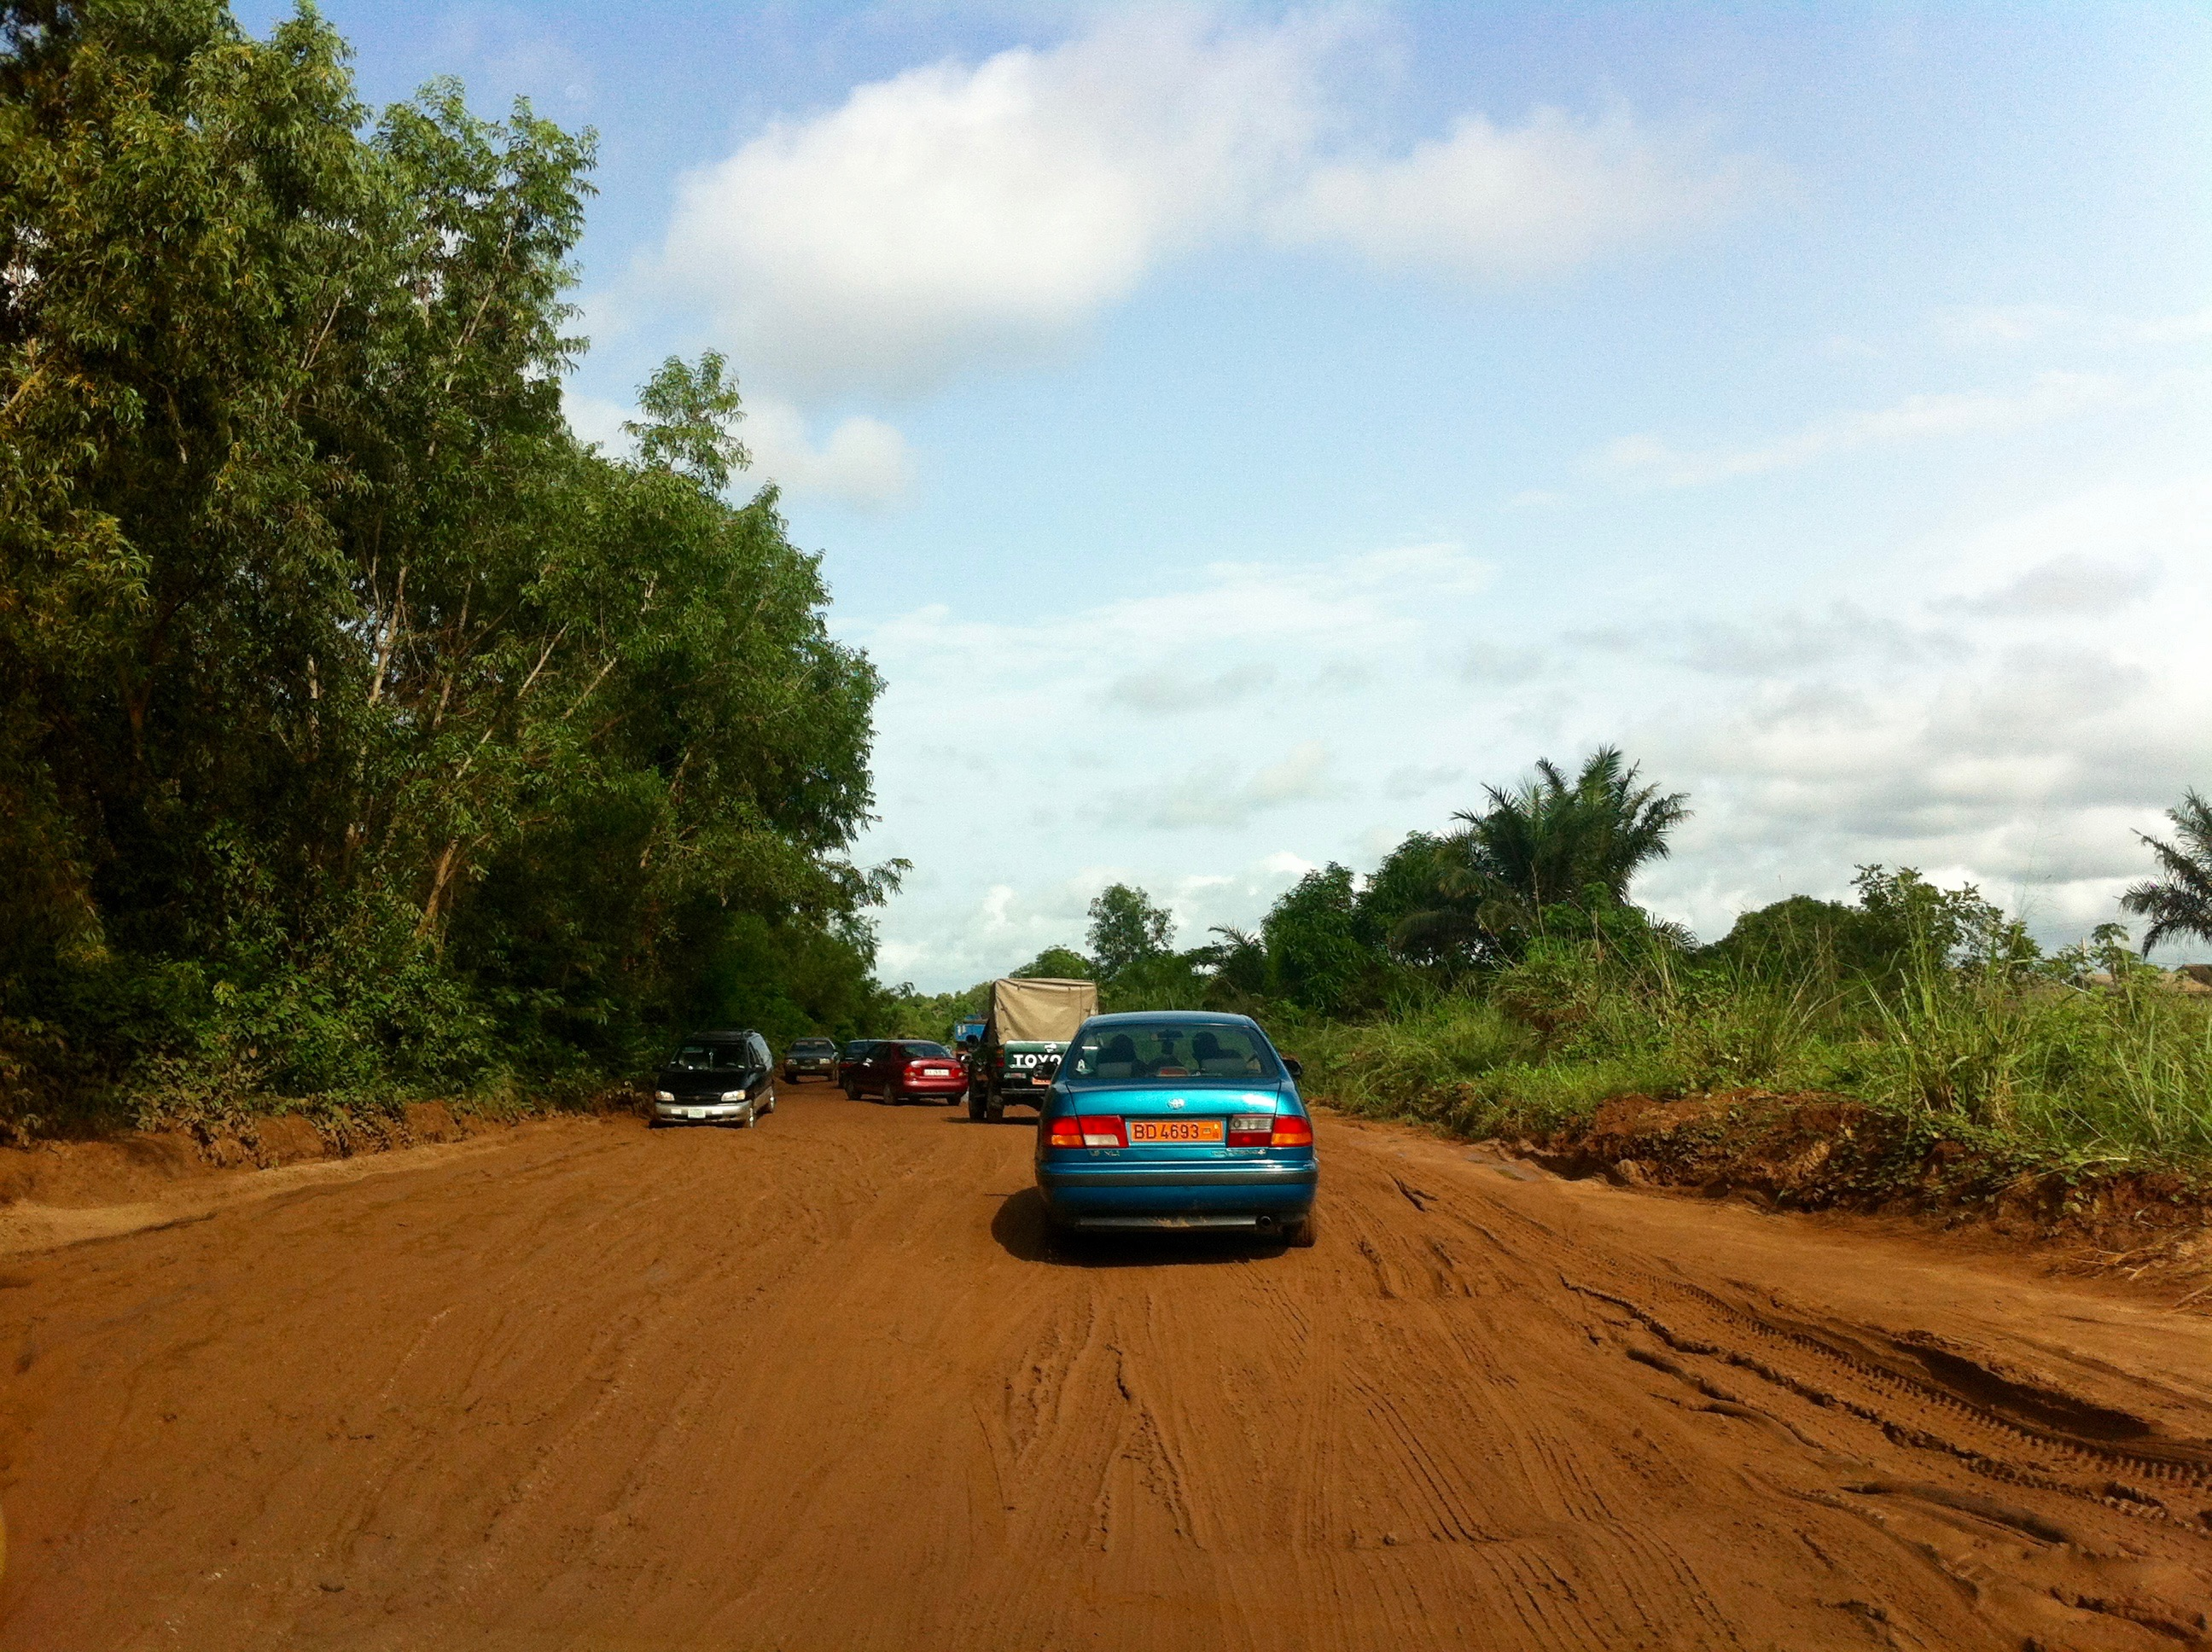 Benin/Togo Road, Pahou, Atlantique Department, Benin. #JujuFilms